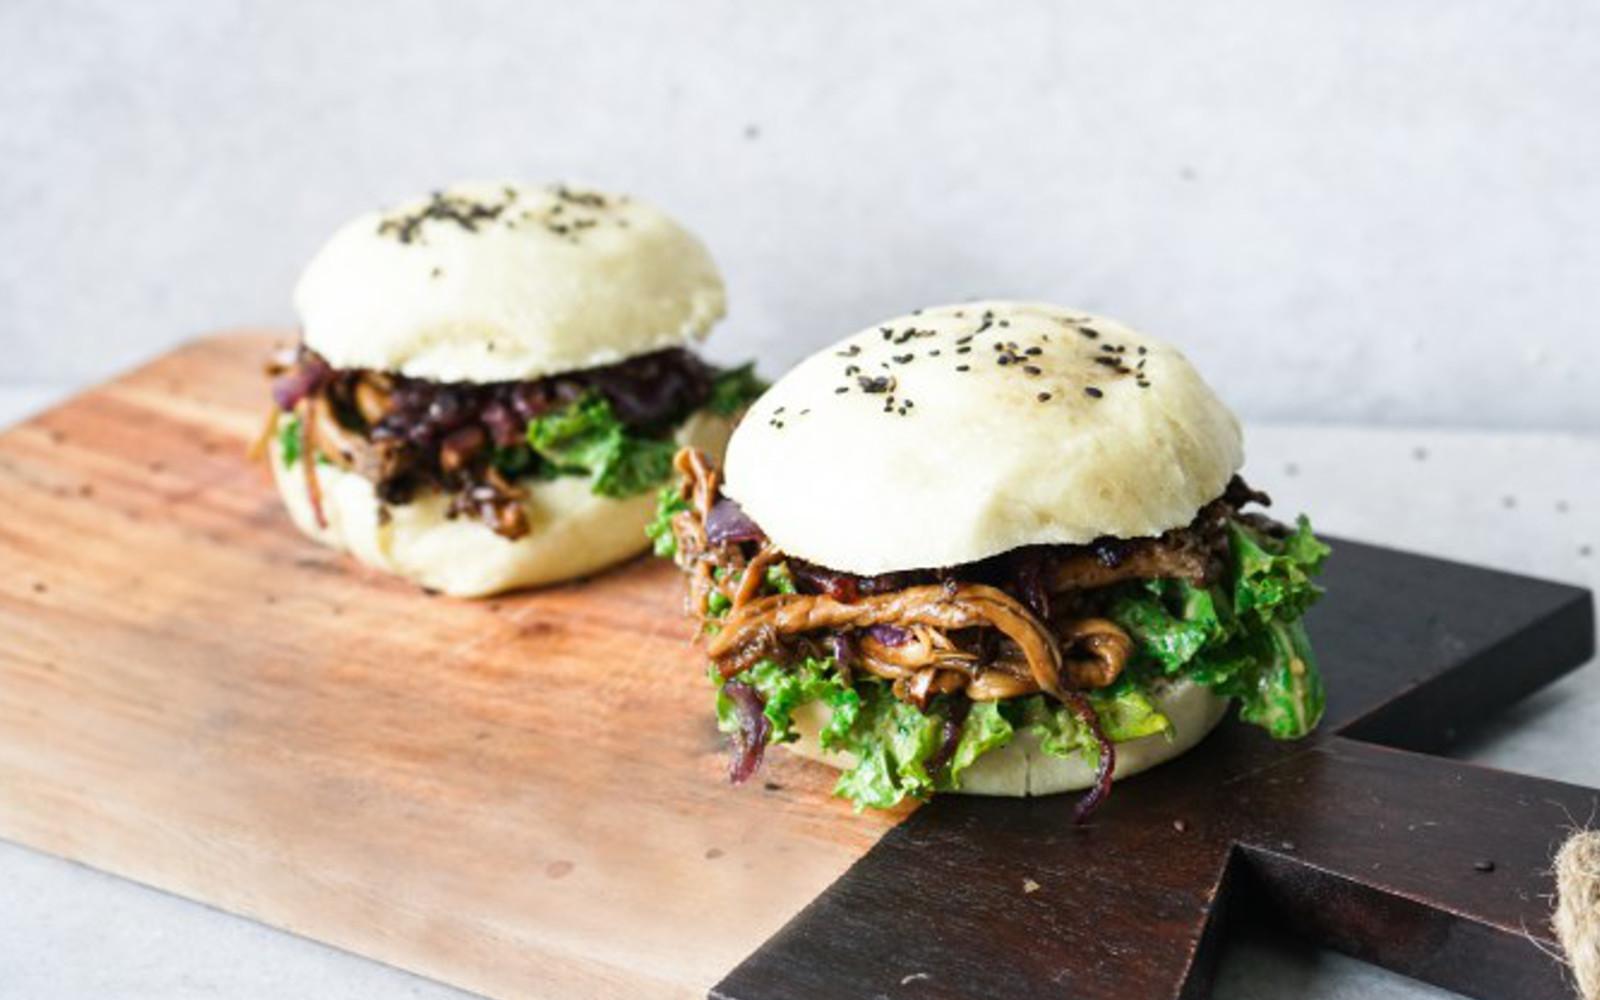 Pulled Oyster Mushroom Bao Burger